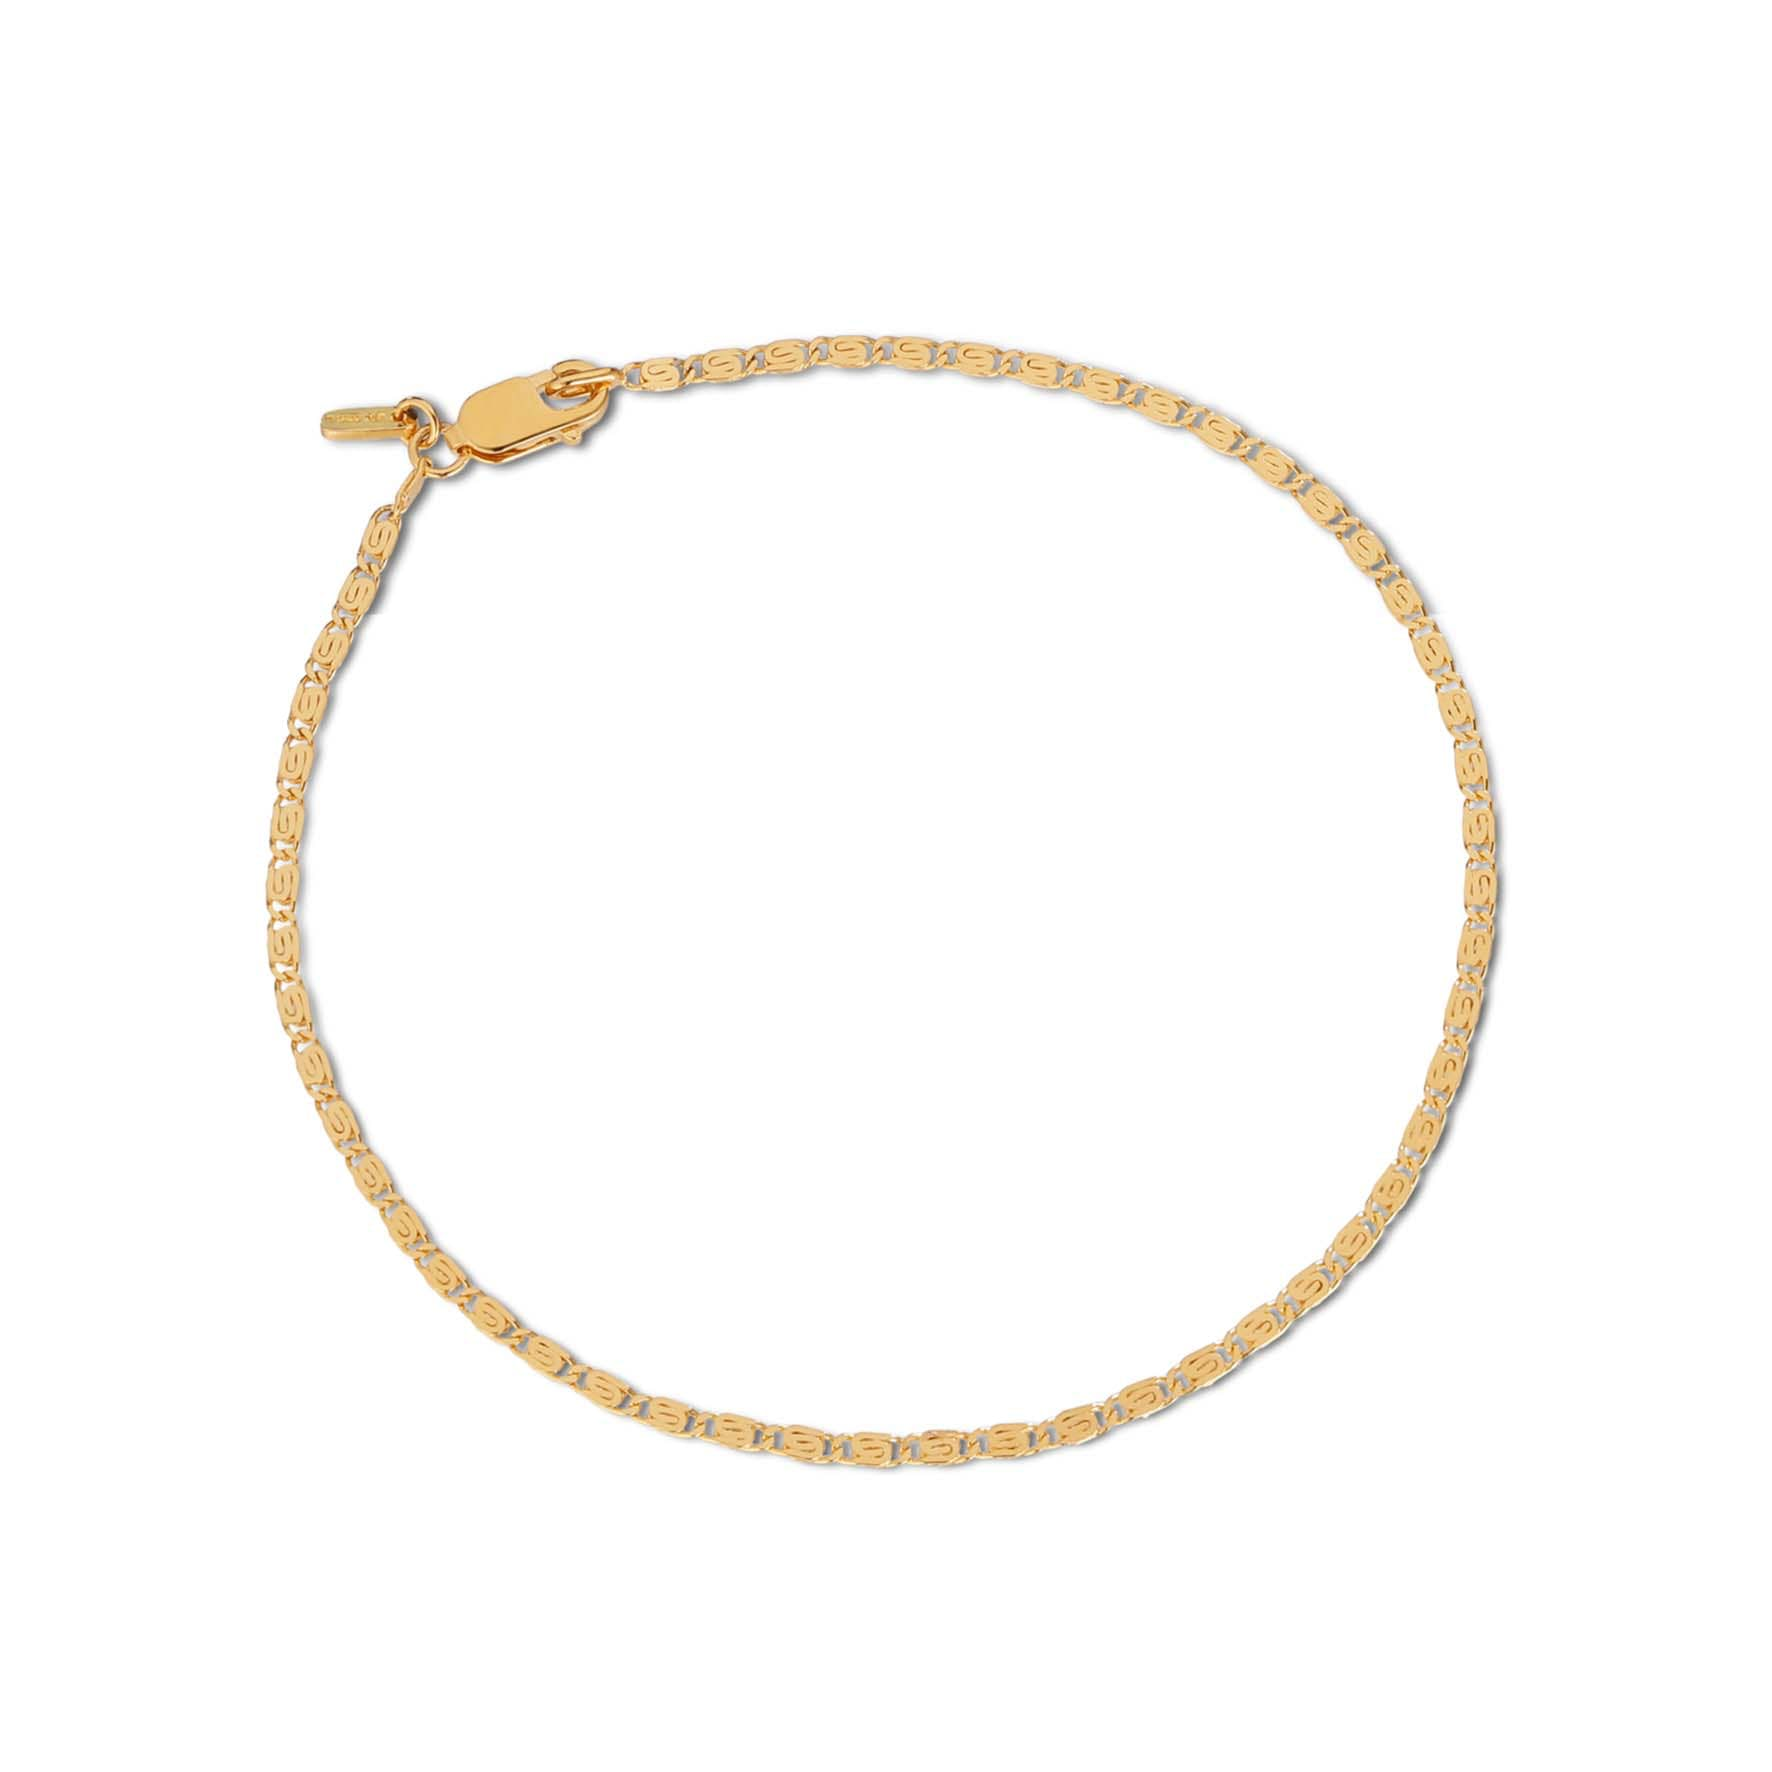 Envision Chain Bracelet from Jane Kønig in Goldplated-Silver Sterling 925